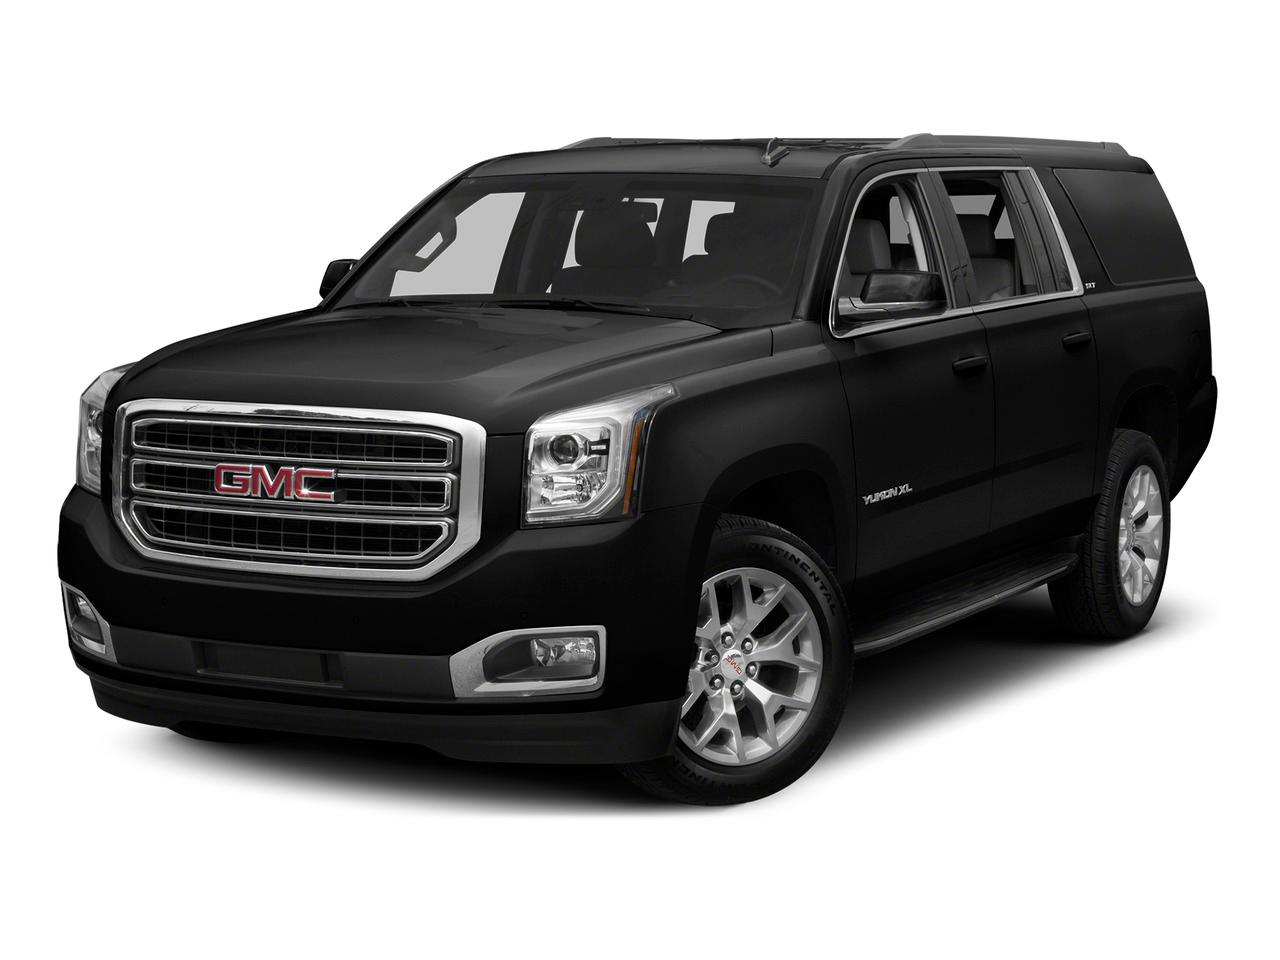 2015 gmc yukon xl slt black 2015 gmc yukon car for sale in peoria il 4480960893 used cars. Black Bedroom Furniture Sets. Home Design Ideas